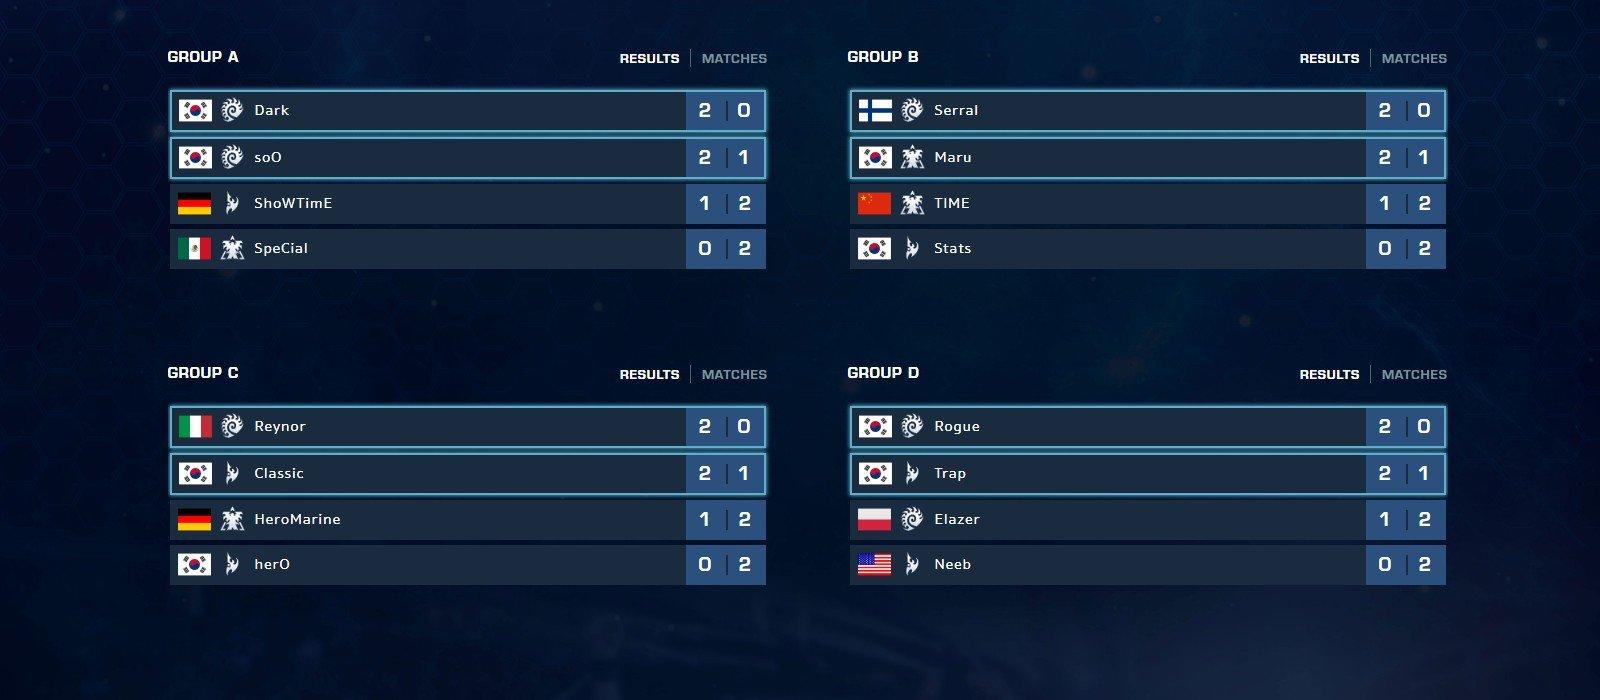 StarCraft II WCS Global Finals 2019 Groups